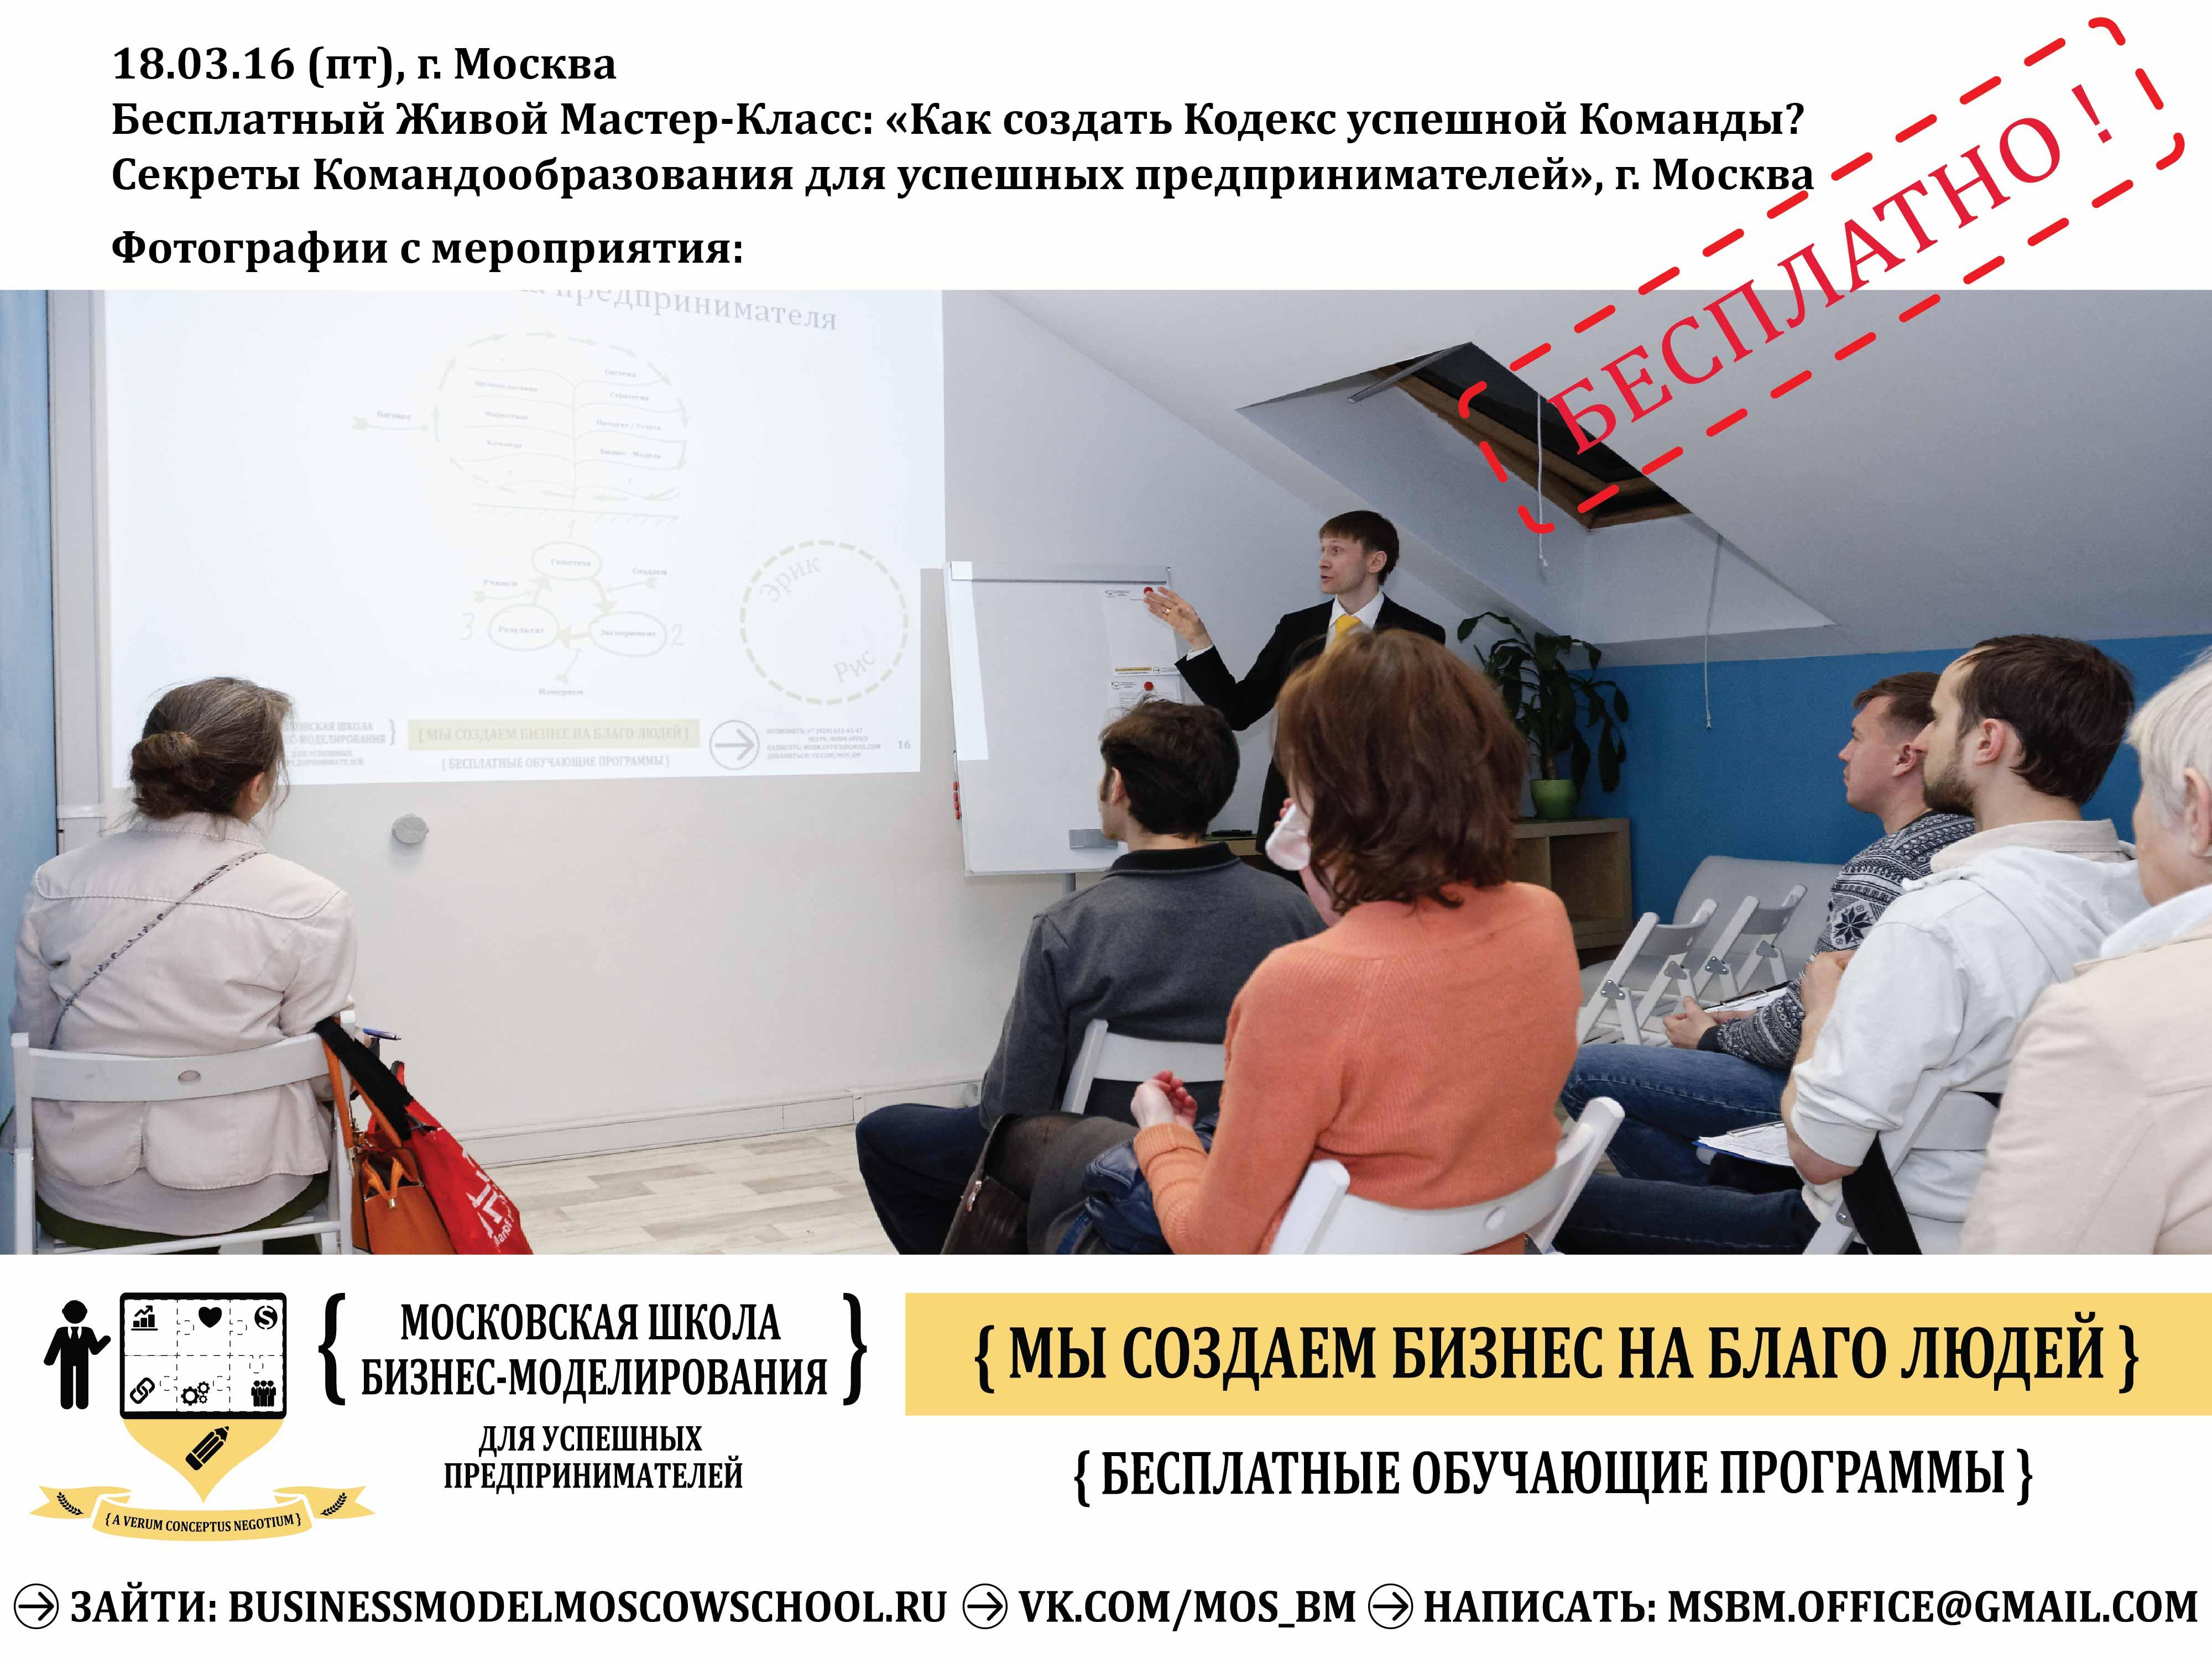 business_model_moscow_school_mclass_photo-18.03.16-1